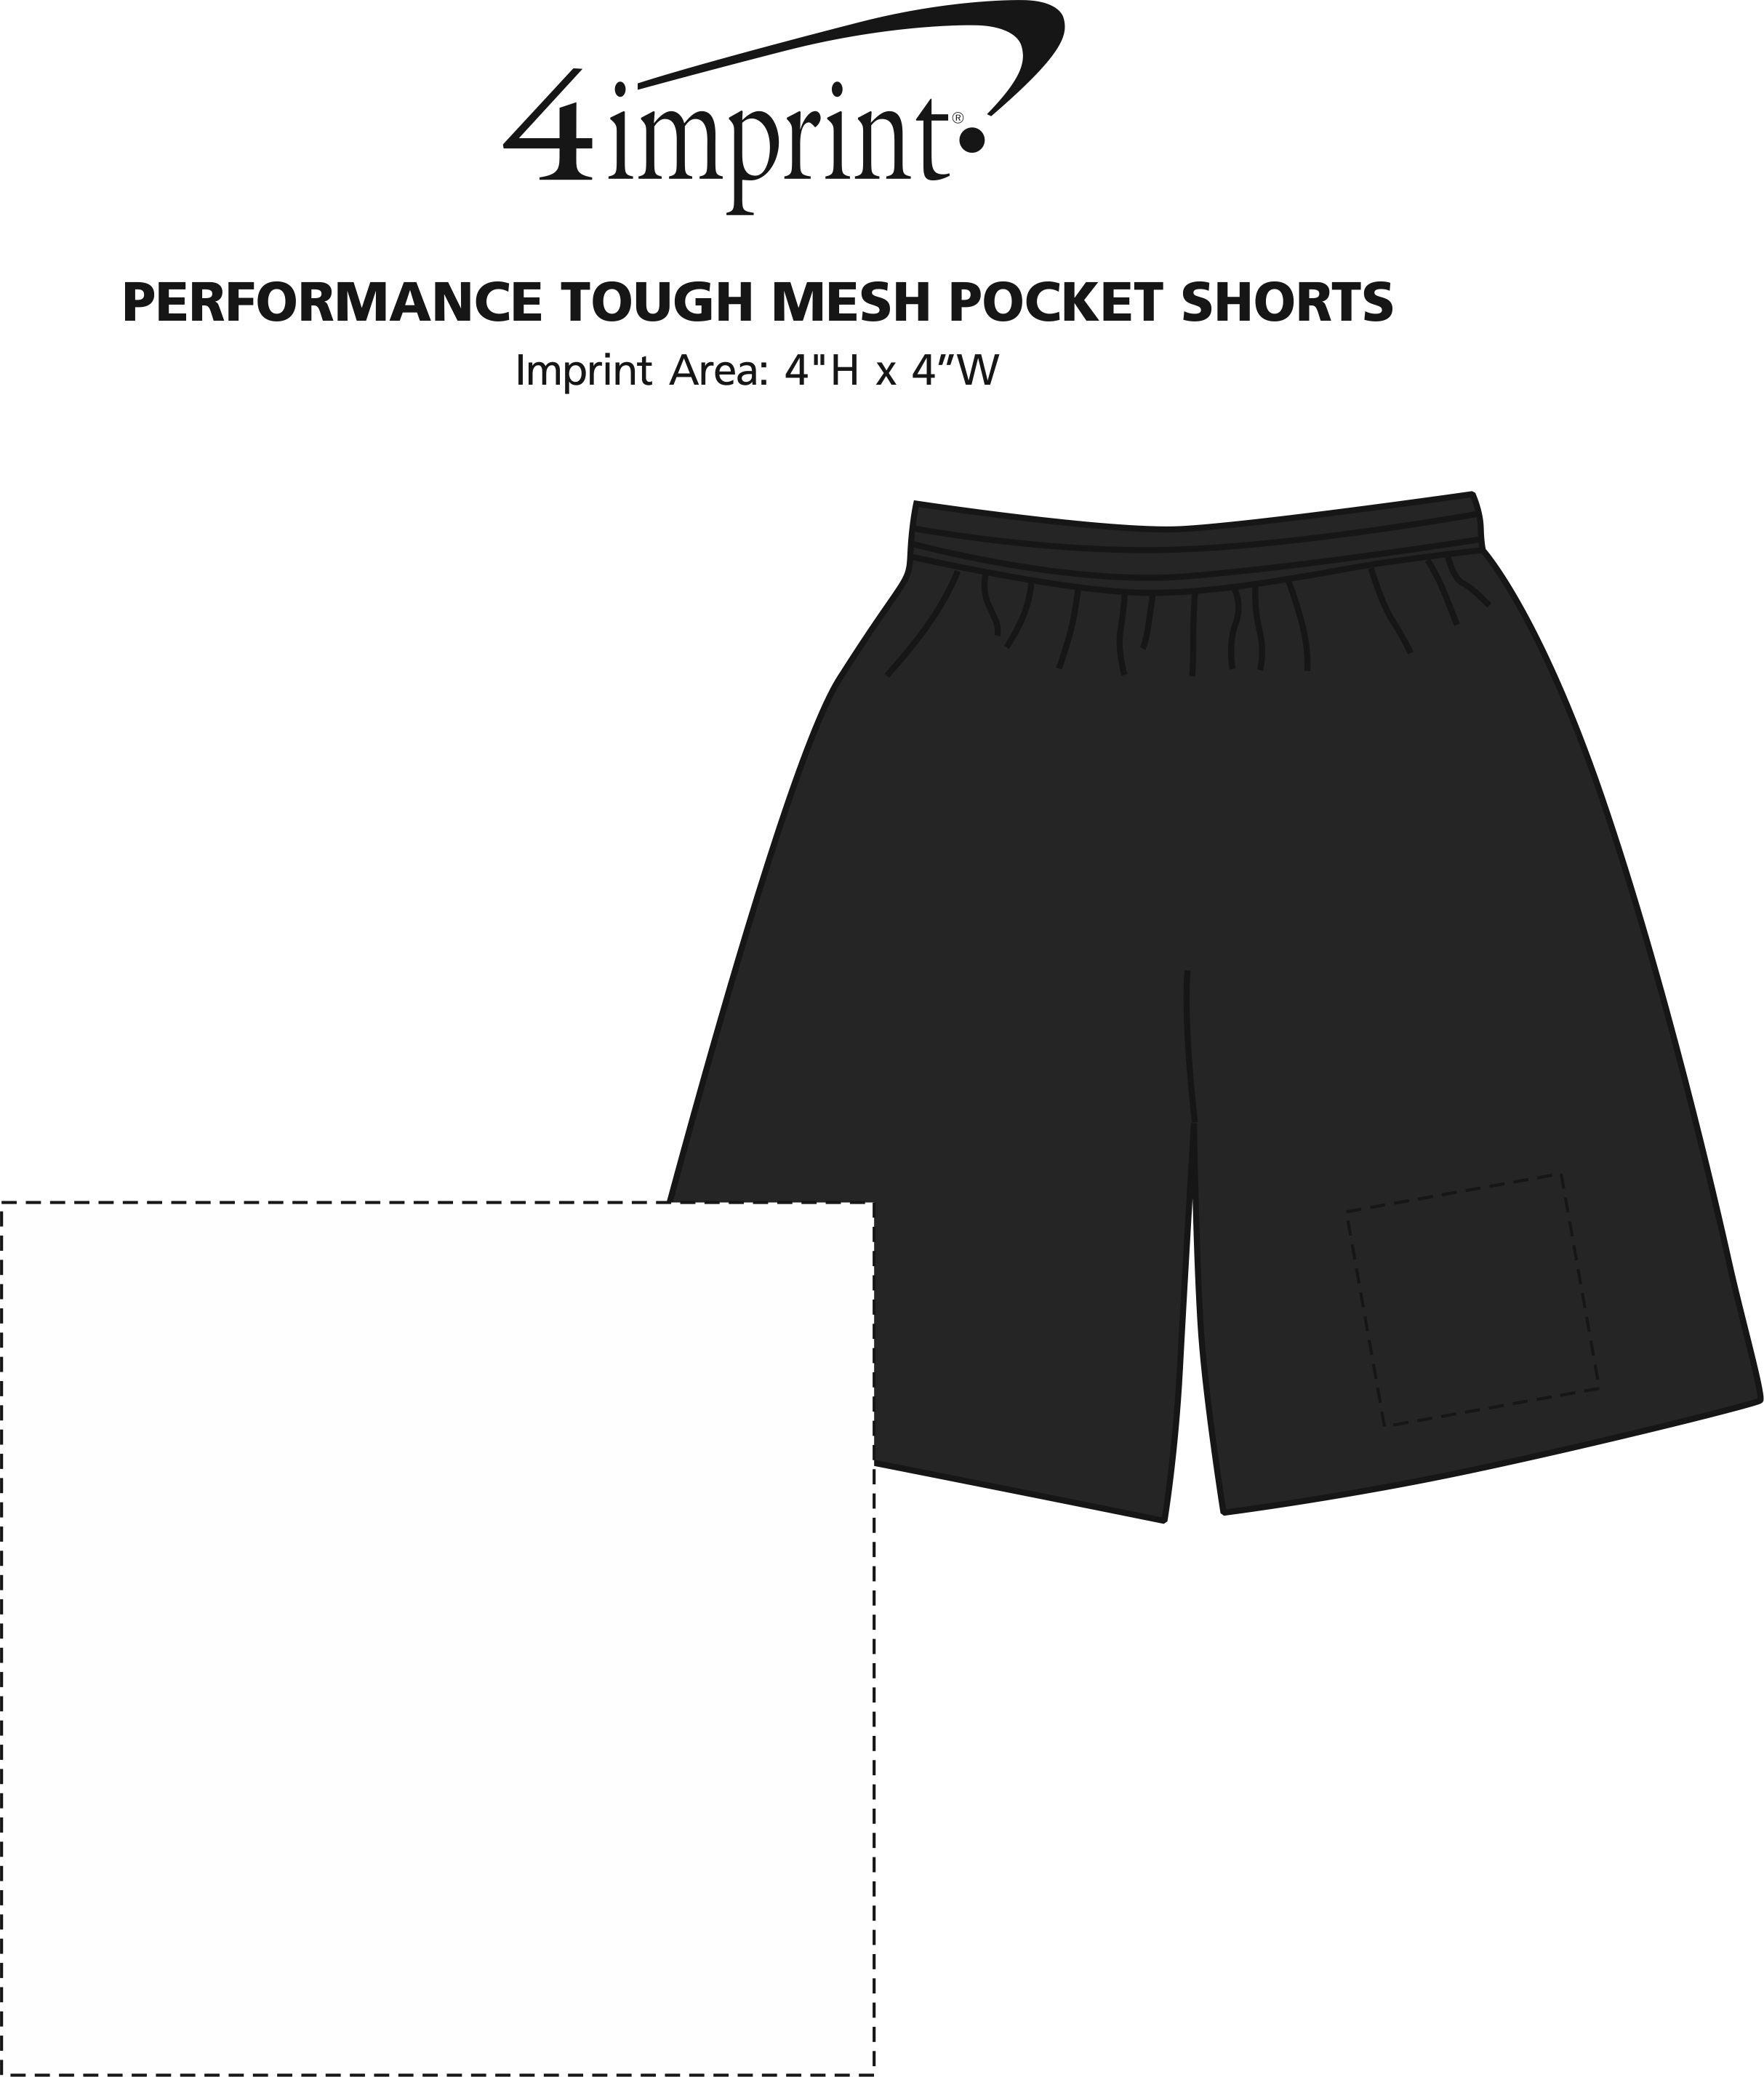 Imprint Area of Performance Tough Mesh Pocket Shorts